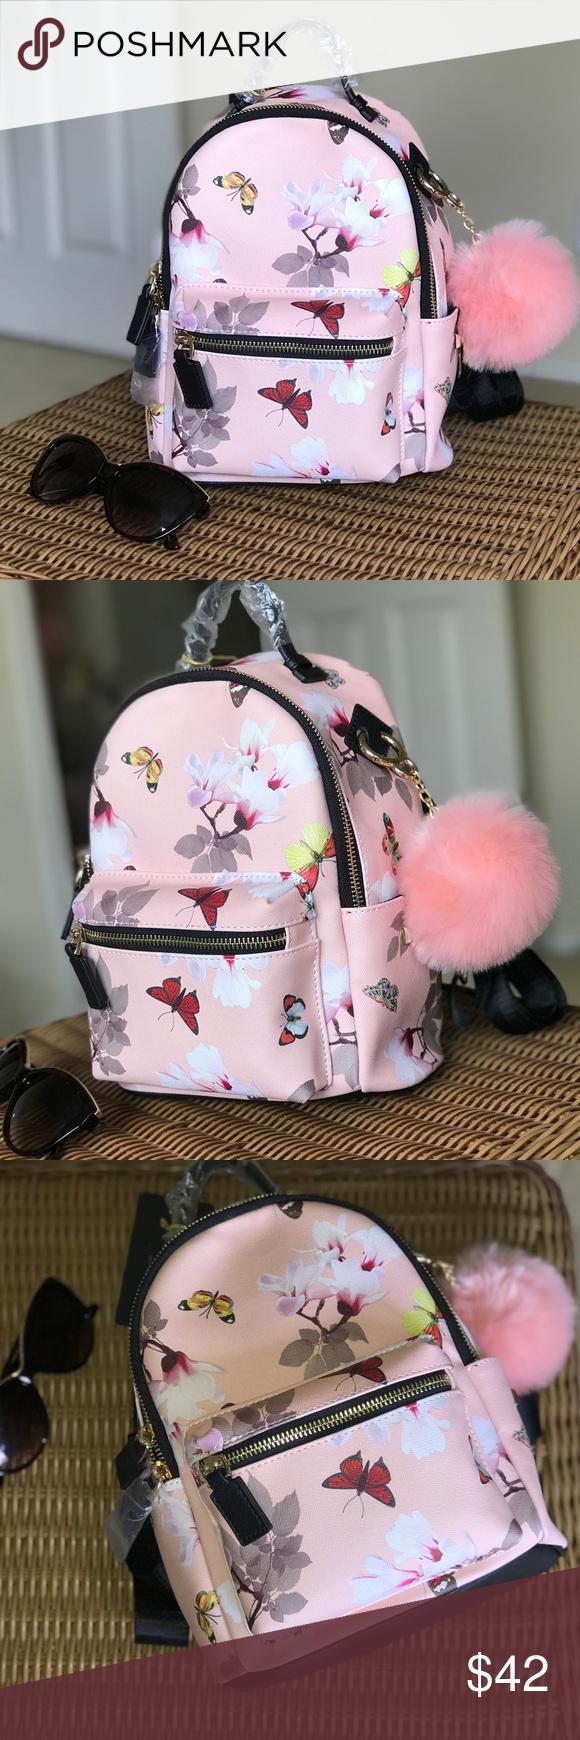 0d37068c80 Black Backpack With Pink Pom Pom | Building Materials Bargain Center